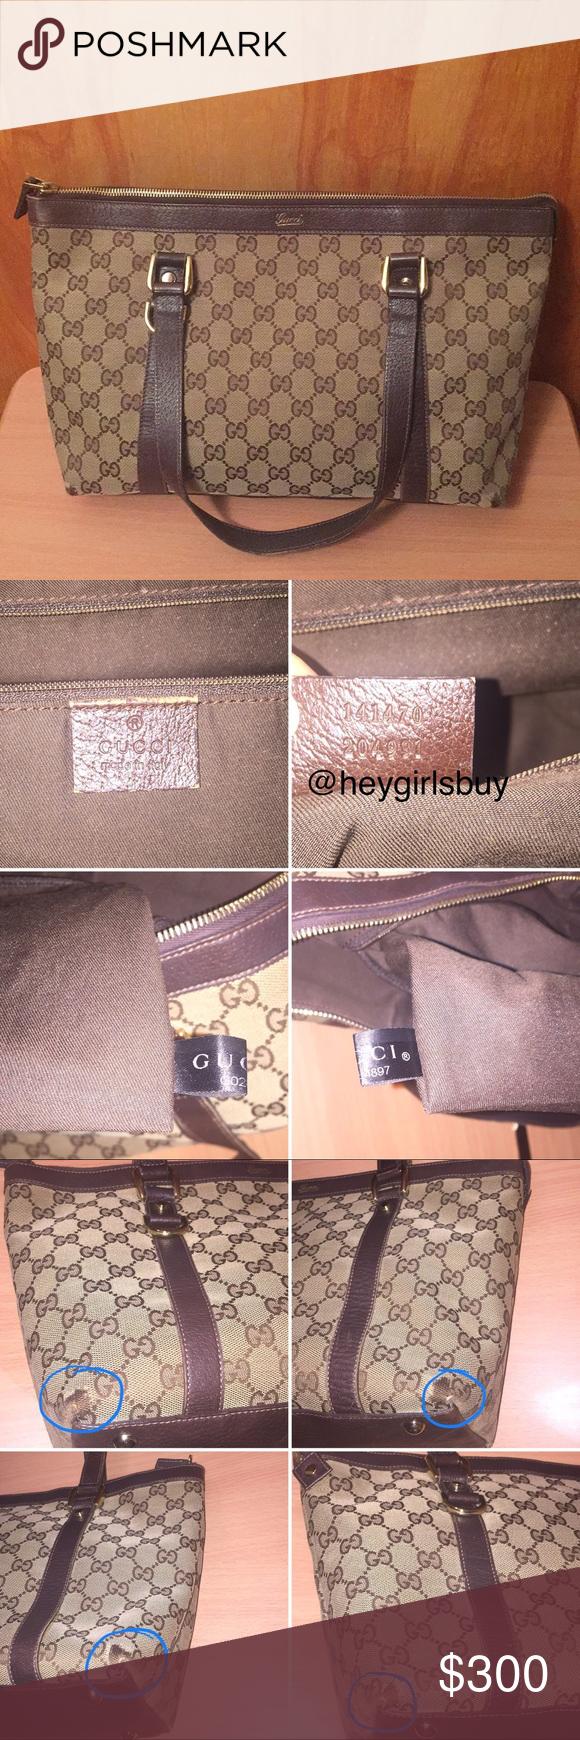 eac547b517c8 Gucci GG Monogram Abbey Tote Shoulder Bag Brown Authentic Gucci Abbey Tote  Brown GG Monogram canvas